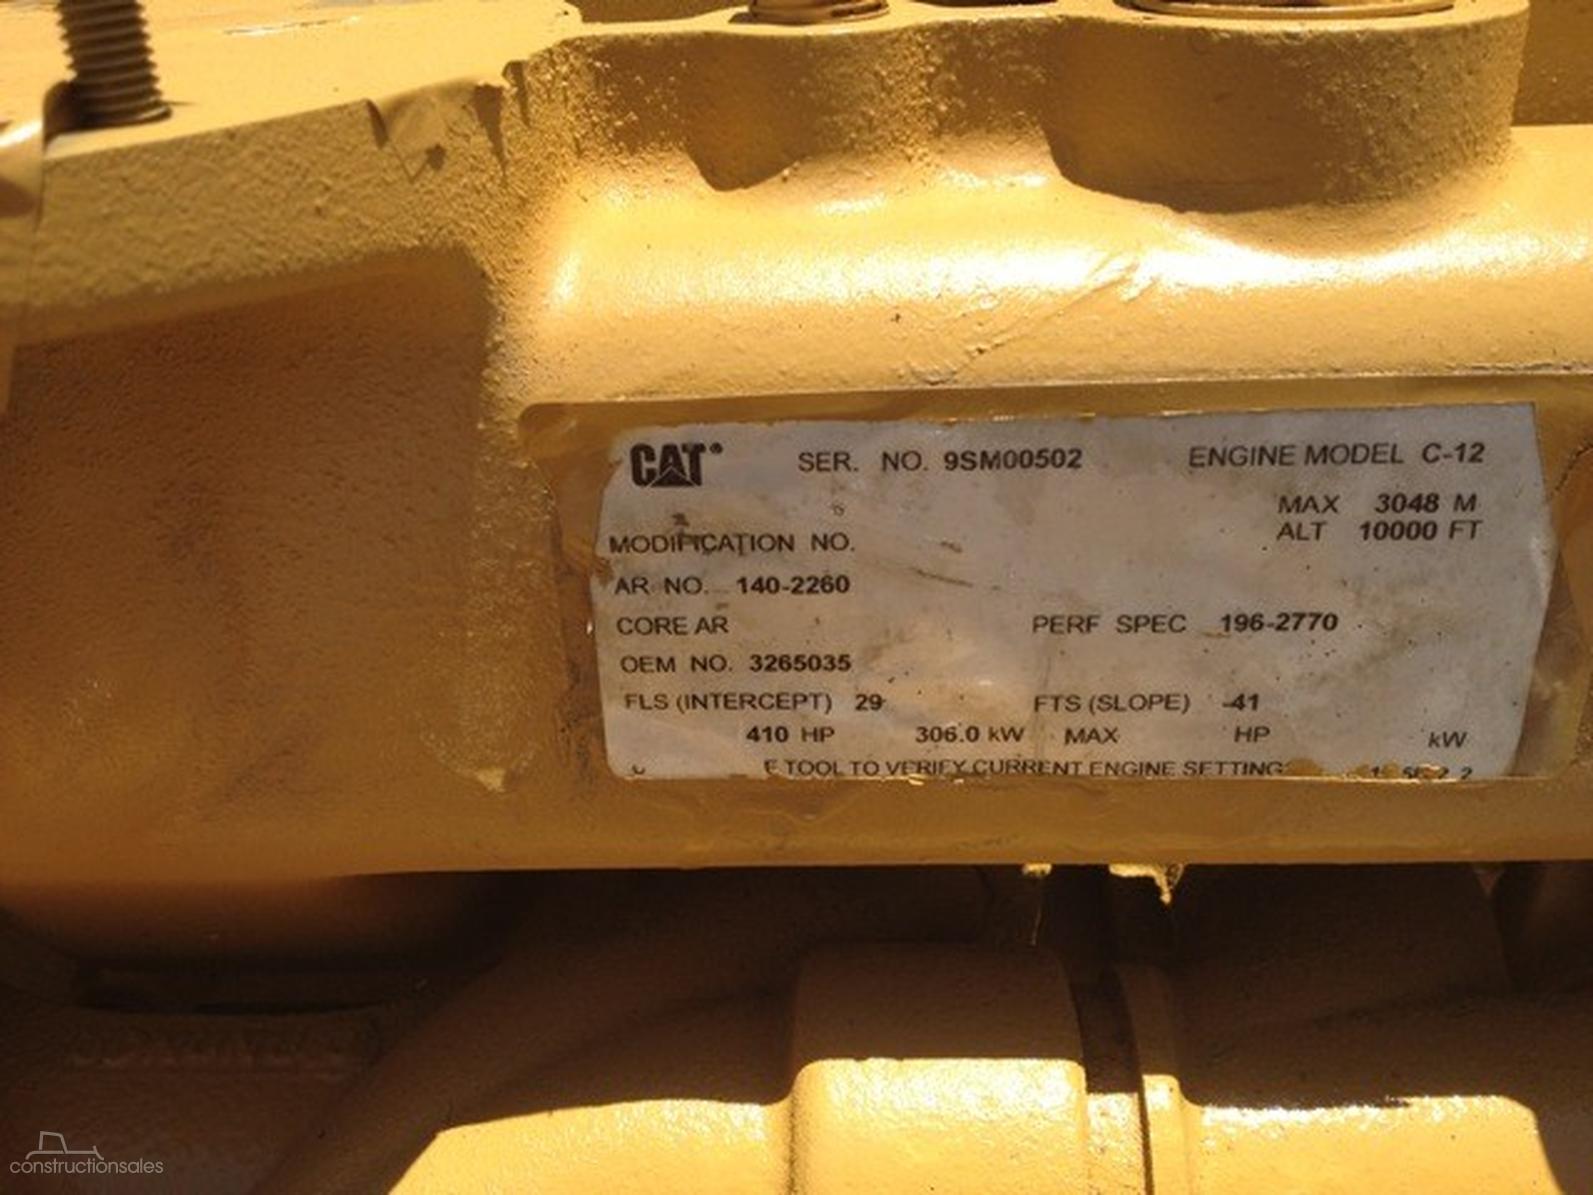 CATERPILLAR C12-AG-AD-378219 - constructionsales com au